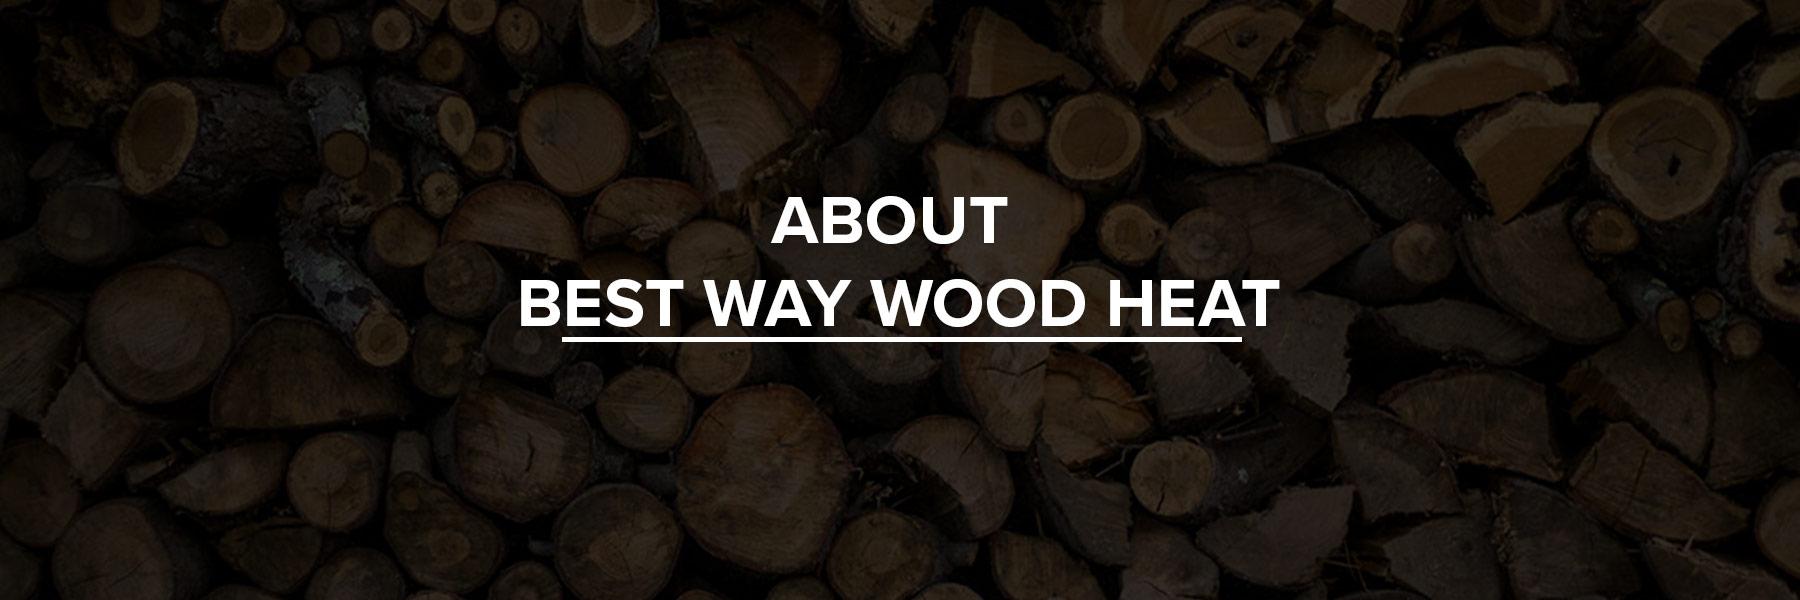 About Best Way Wood Heat